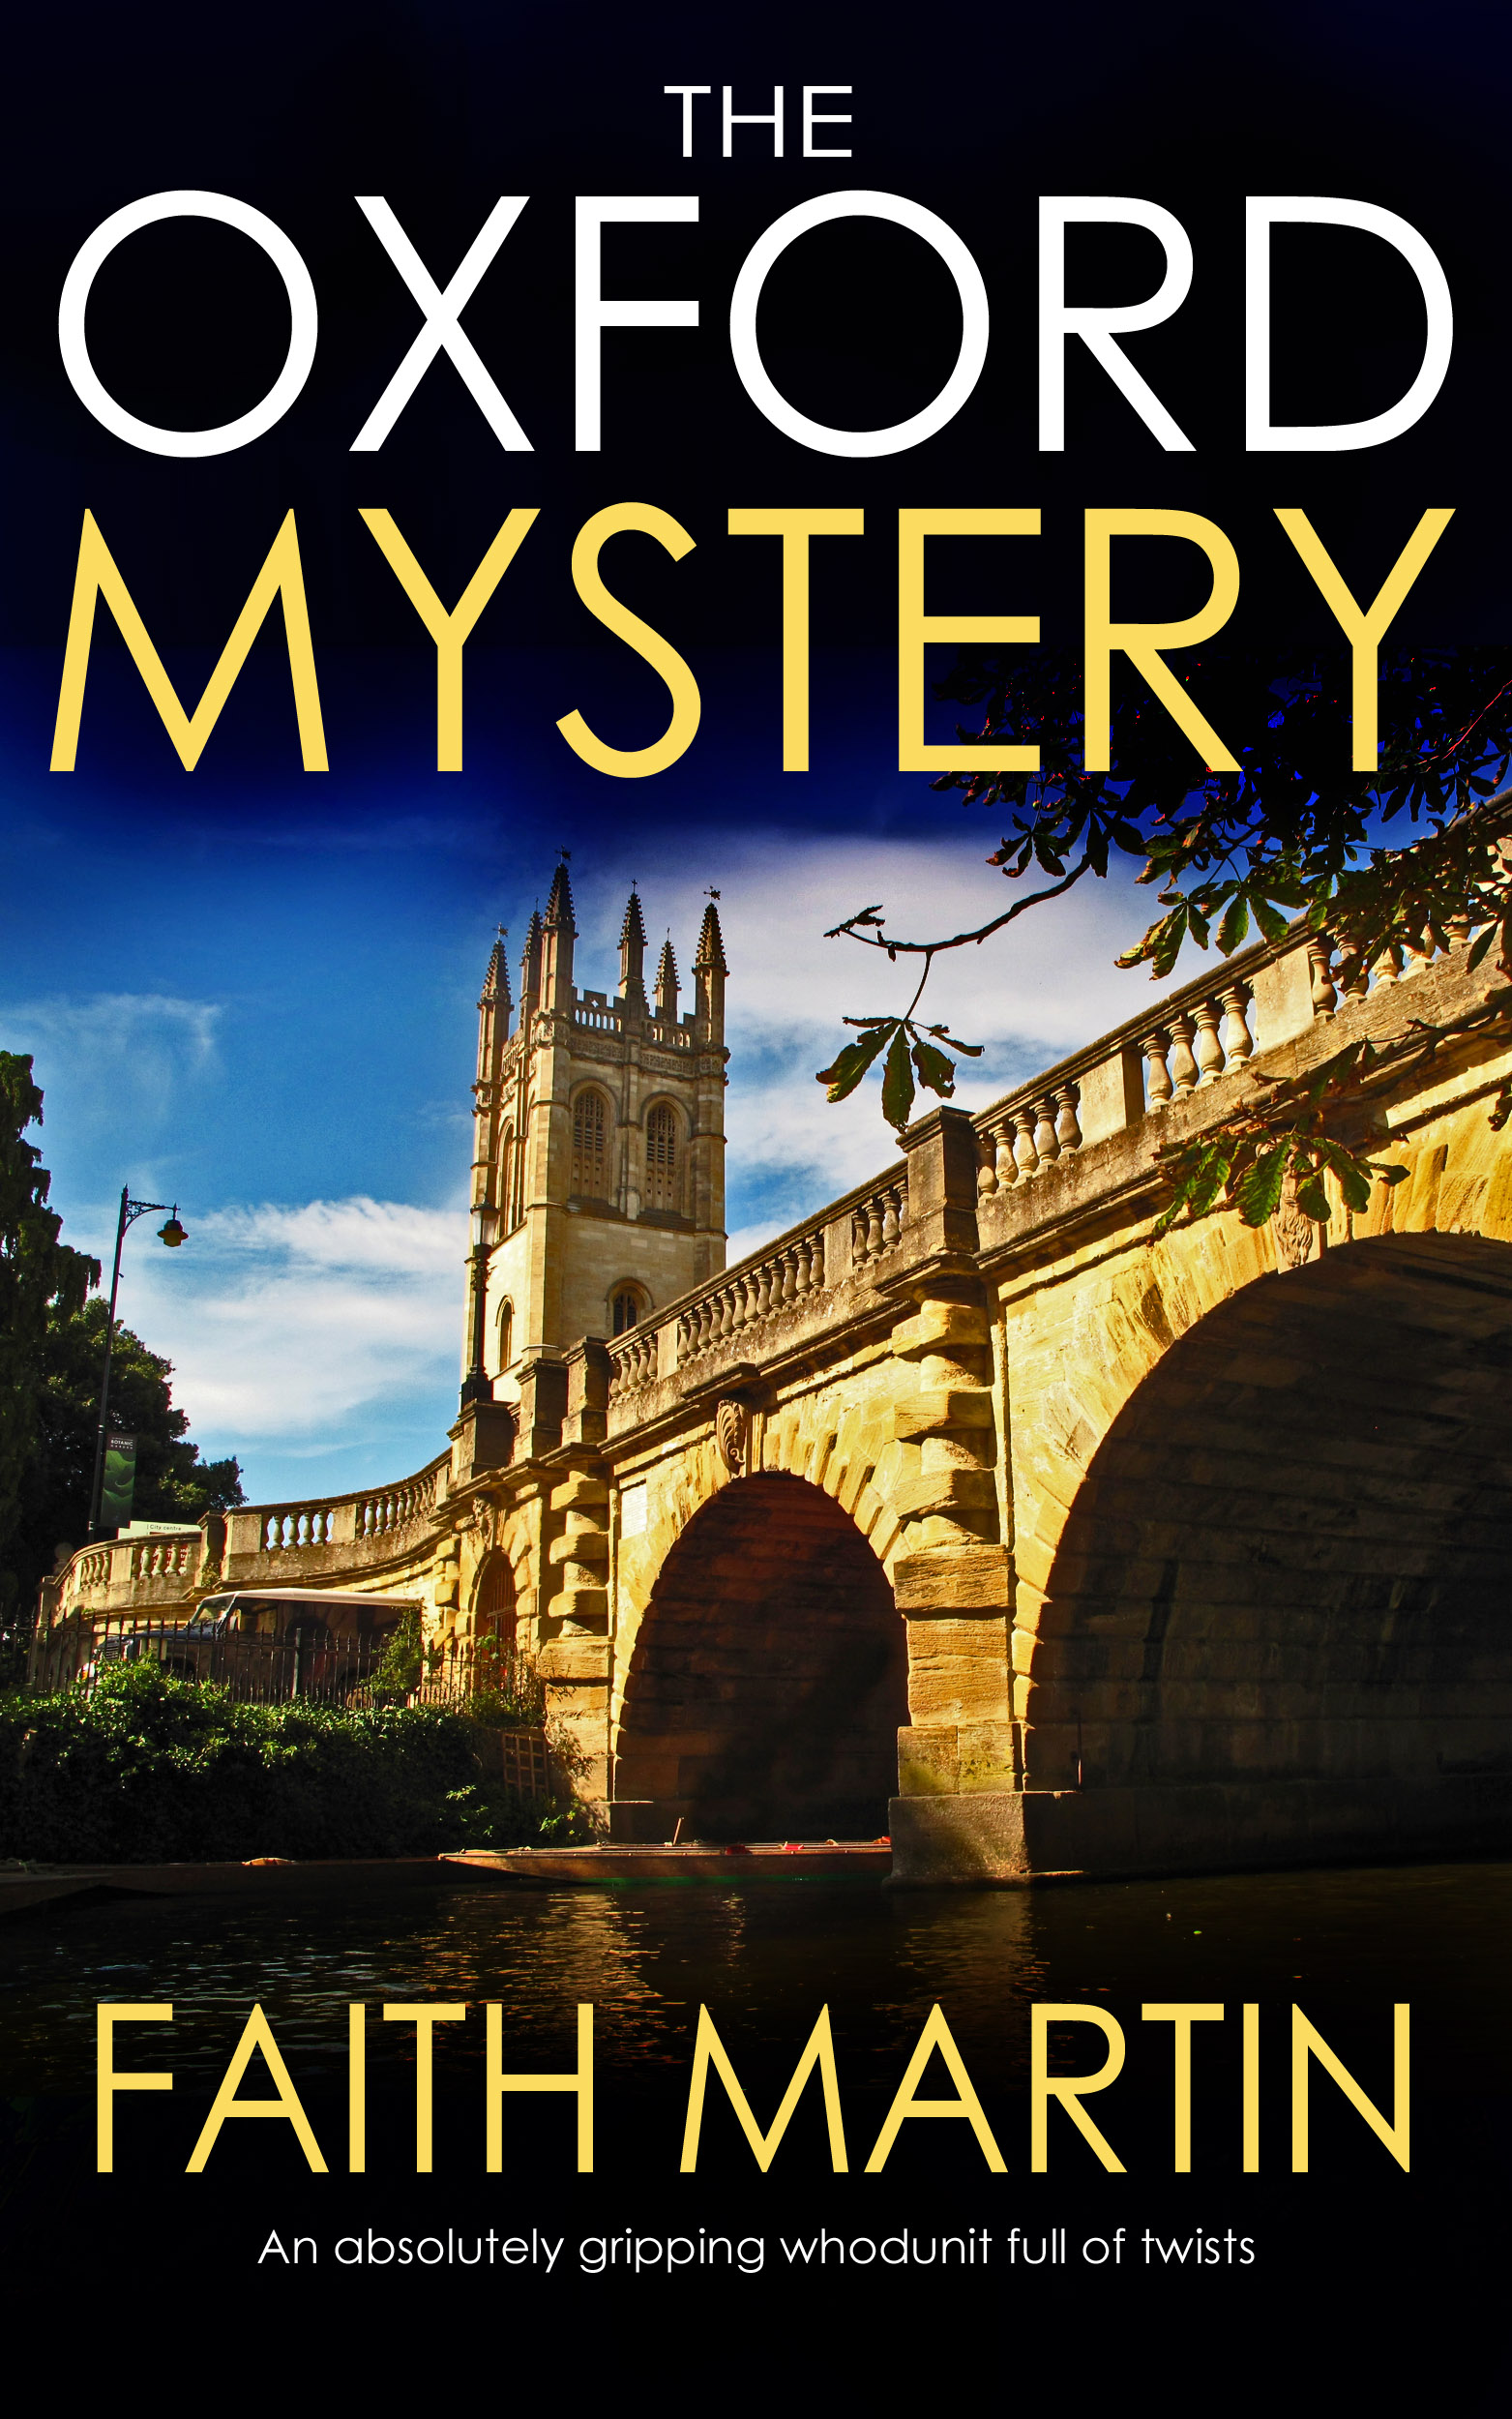 THE OXFORD MYSTERY.jpg